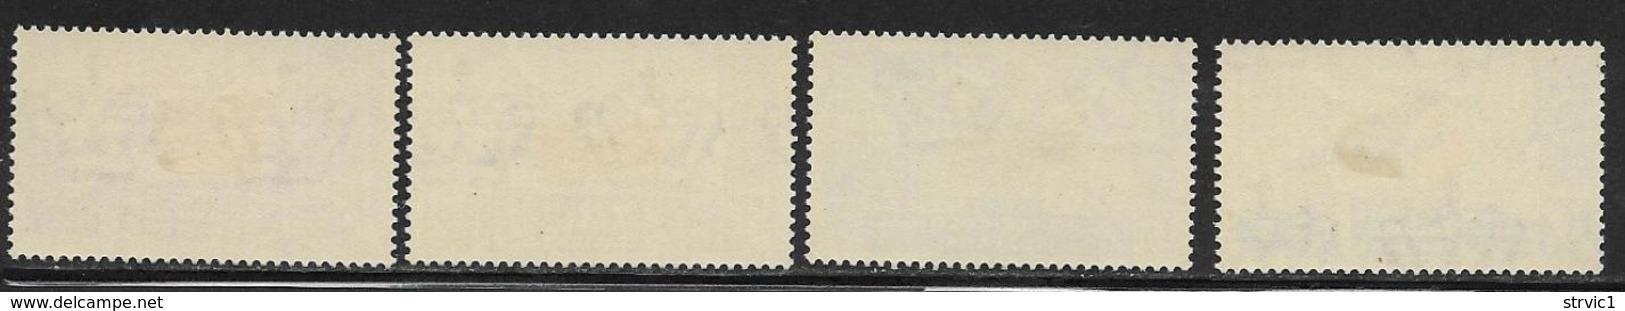 Italian Colonies Scott # C15-8 Mint Hinged Plane,Map, 1933, CV$114.00 - Italy